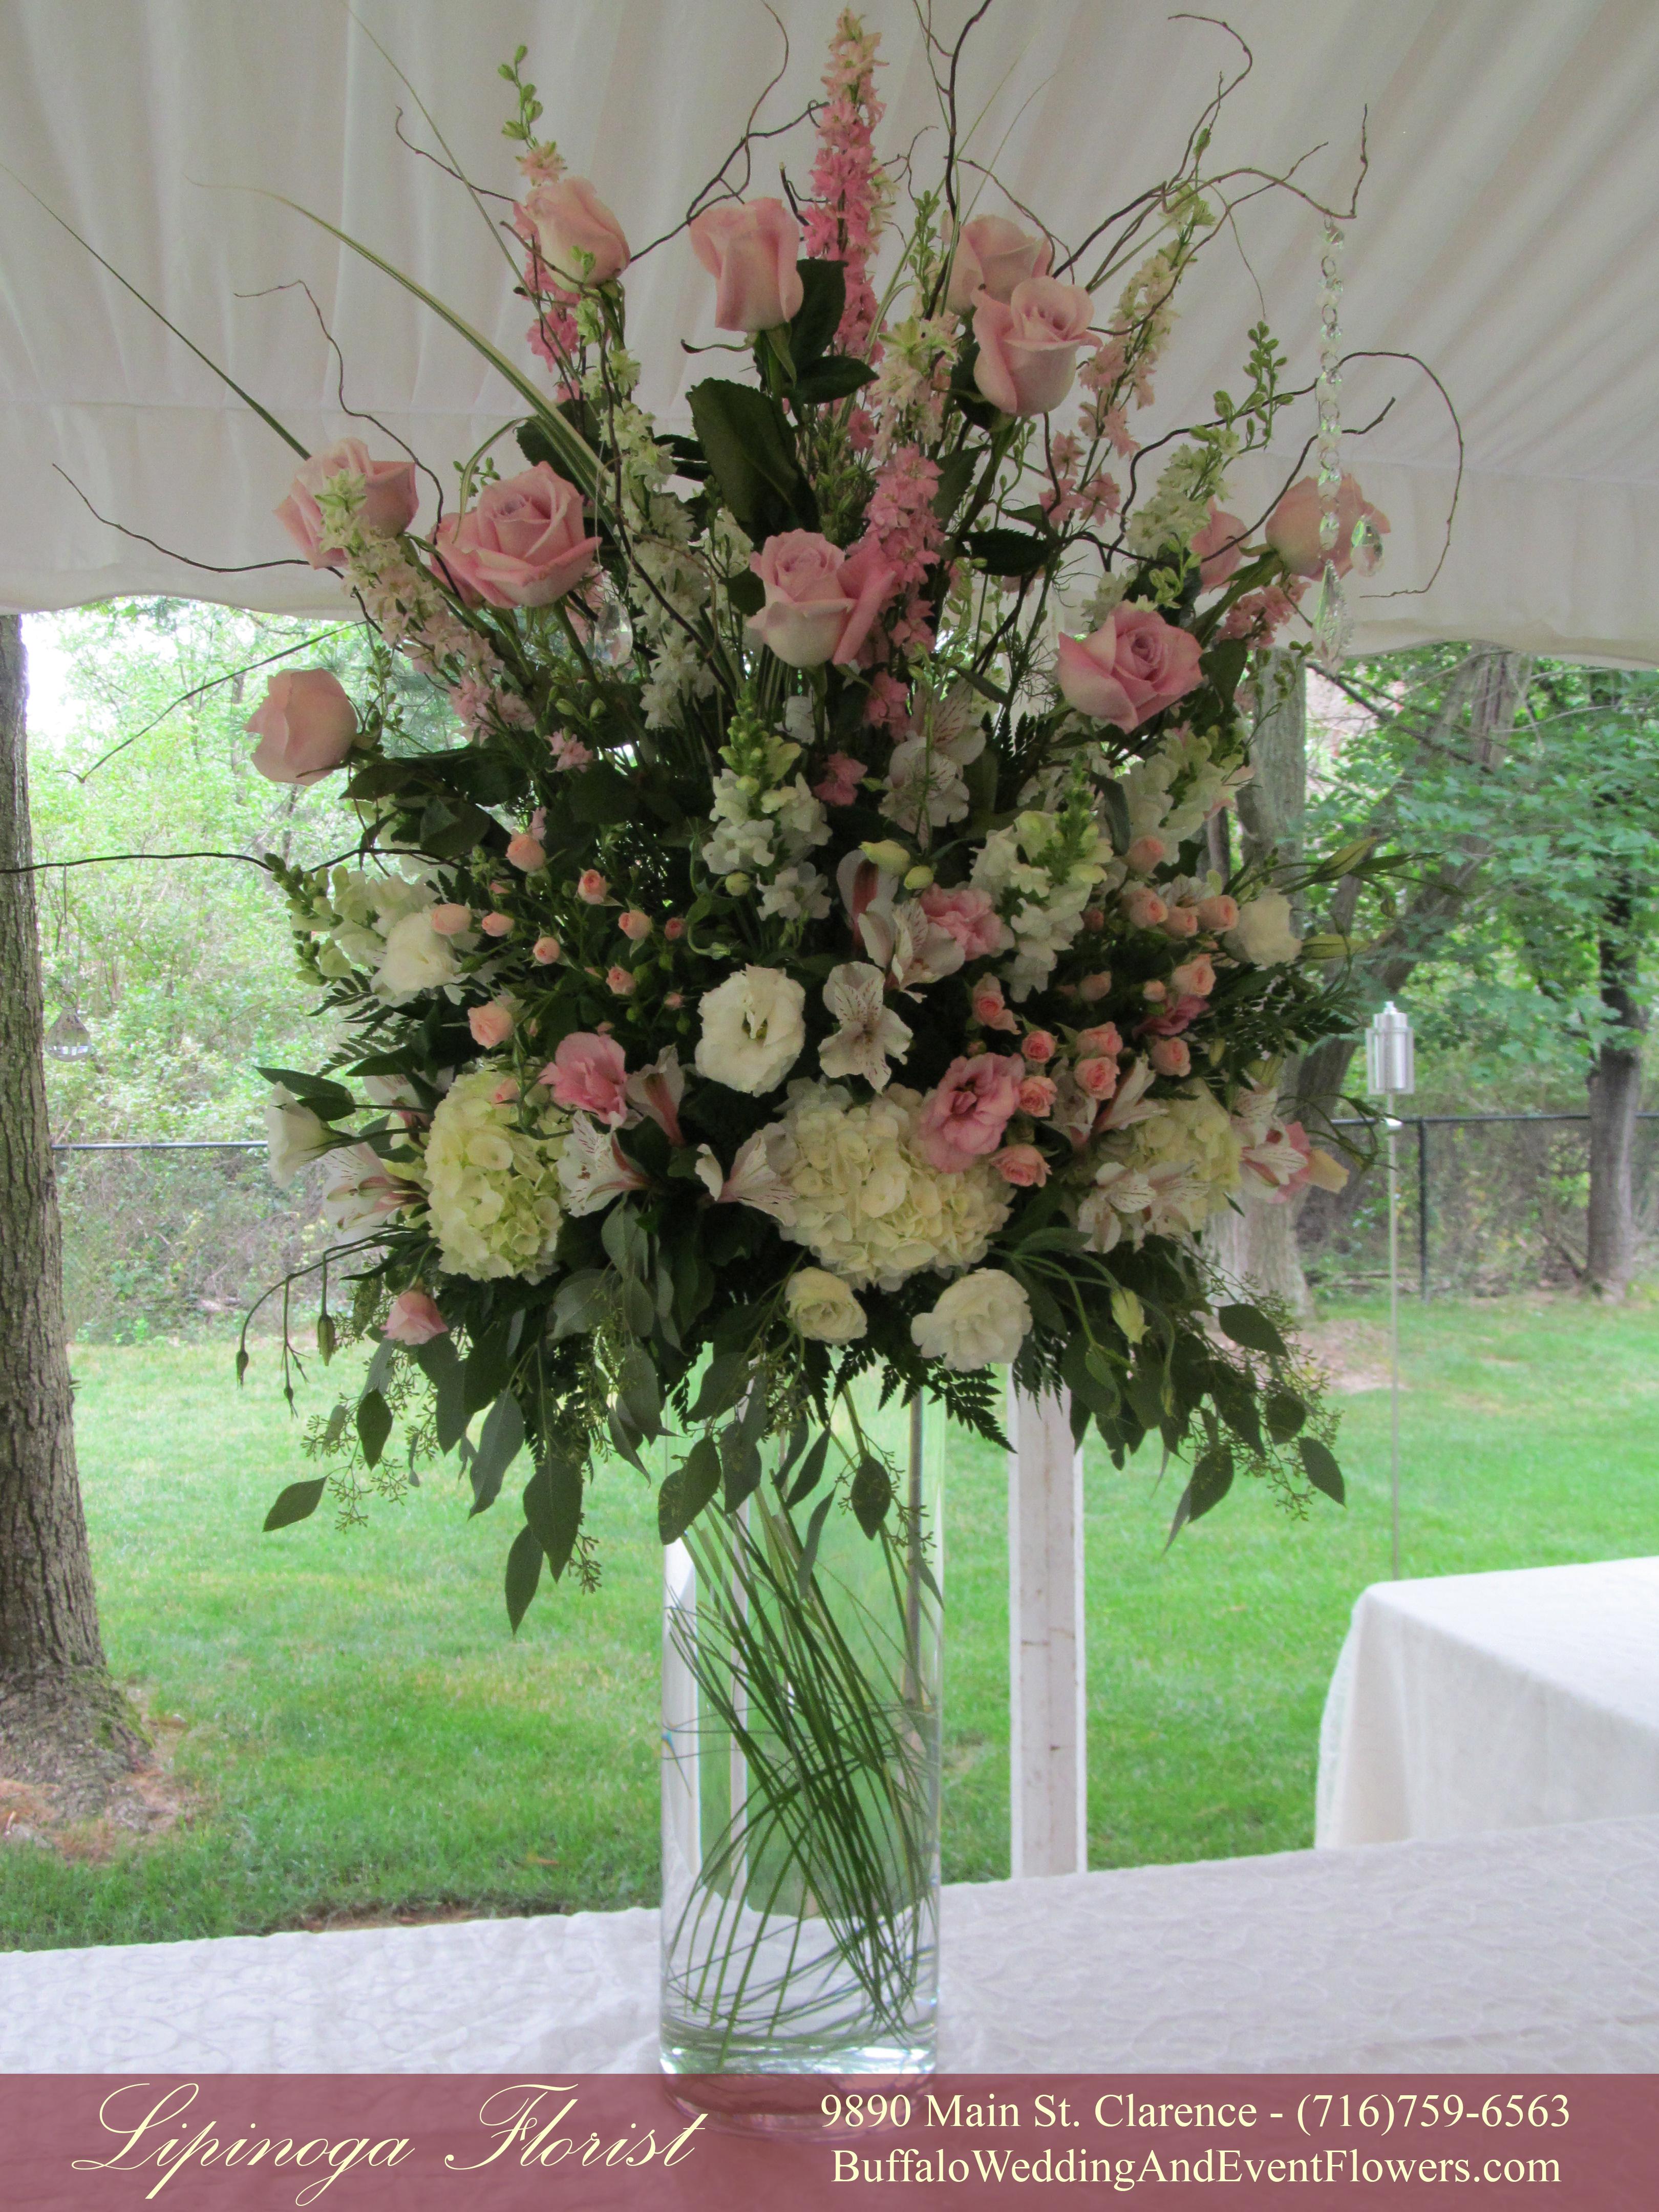 Wedding Flowers Buffalo Wedding Event Flowers By Lipinoga Florist